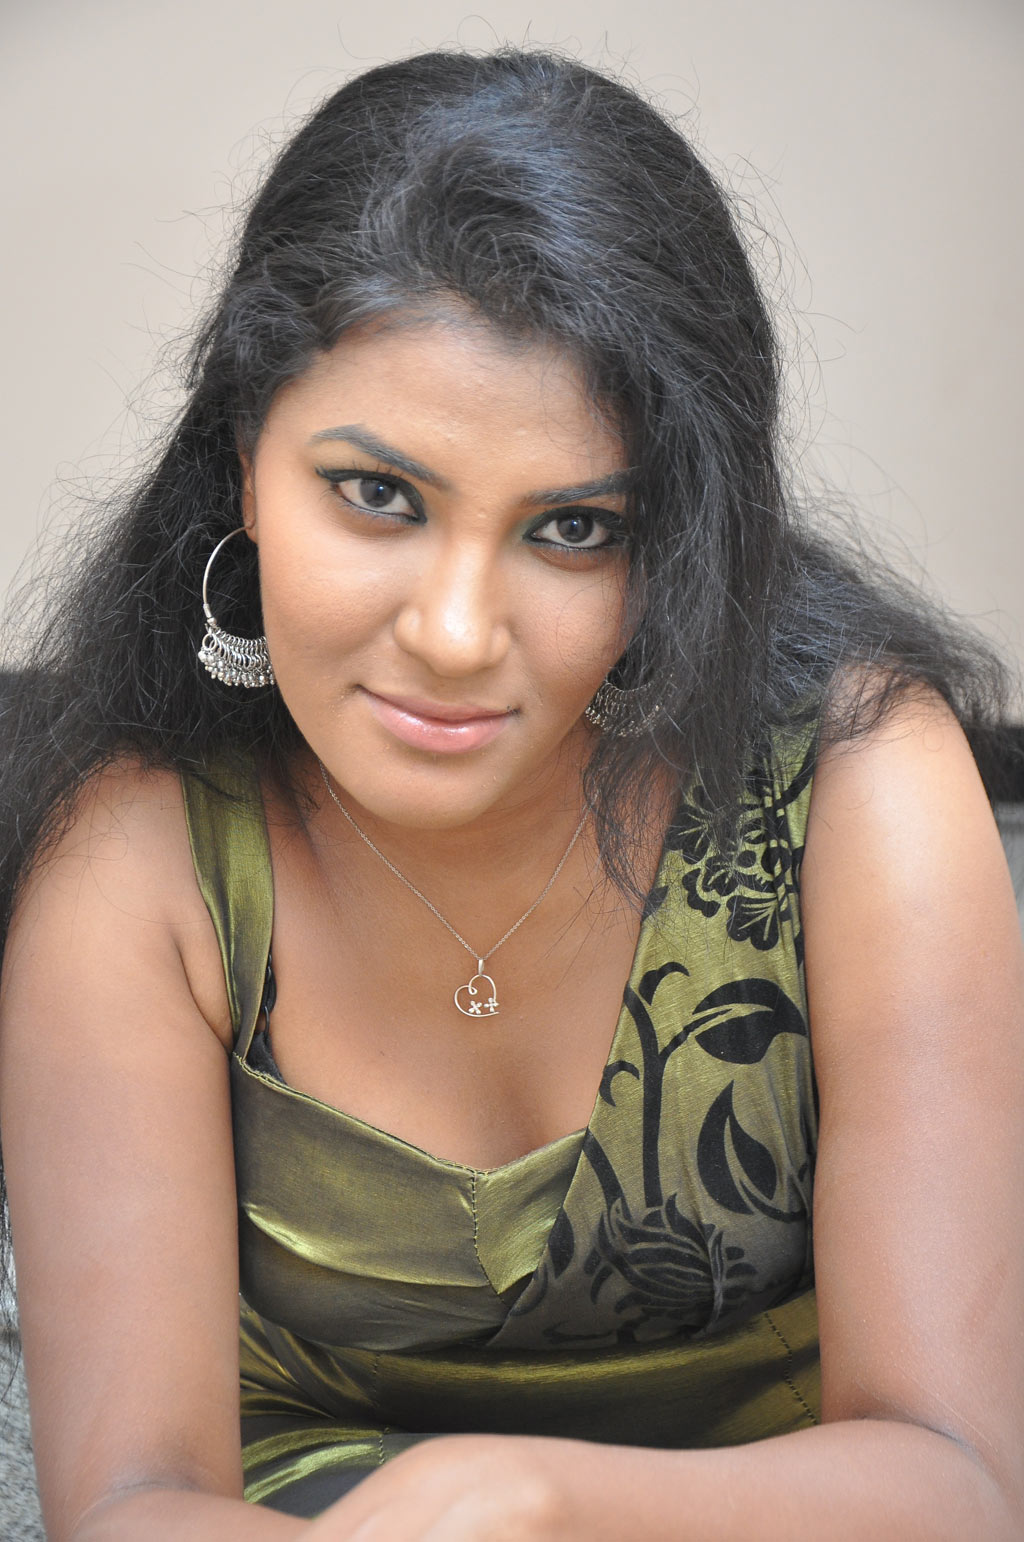 actress tamil rhythamika stills launch unknown special telugu actor latest press